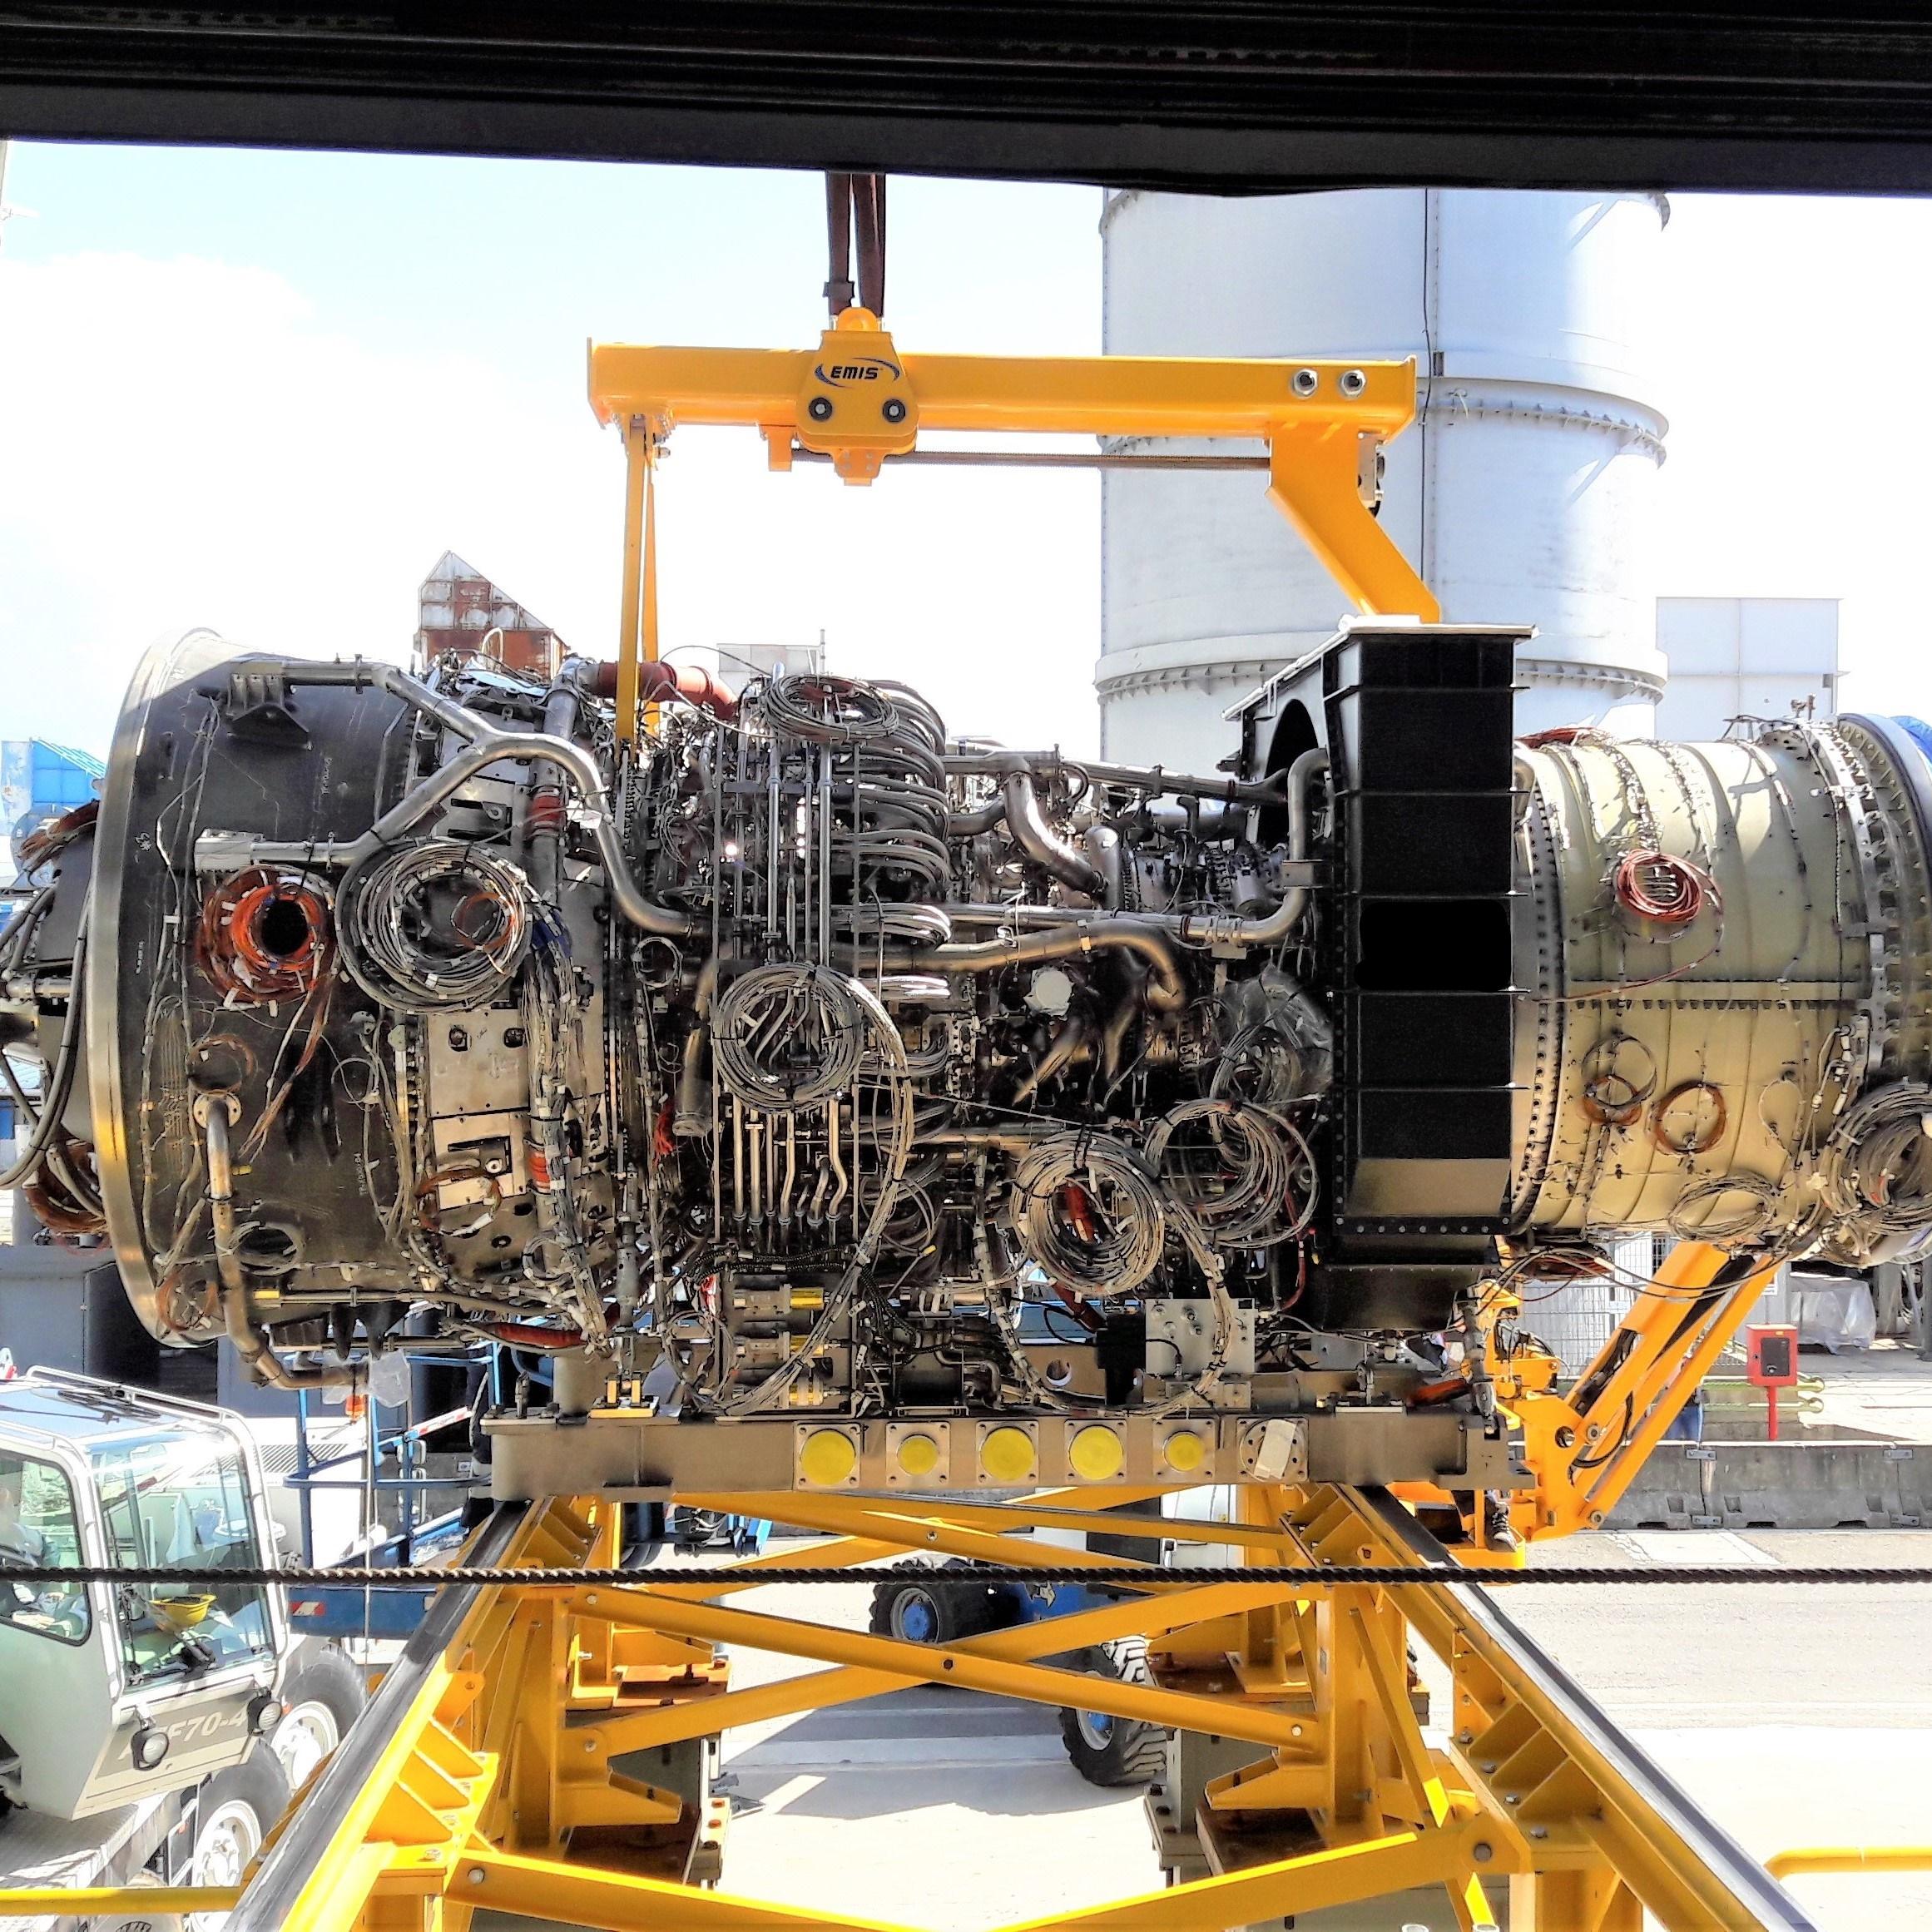 LM9000 Maintenance